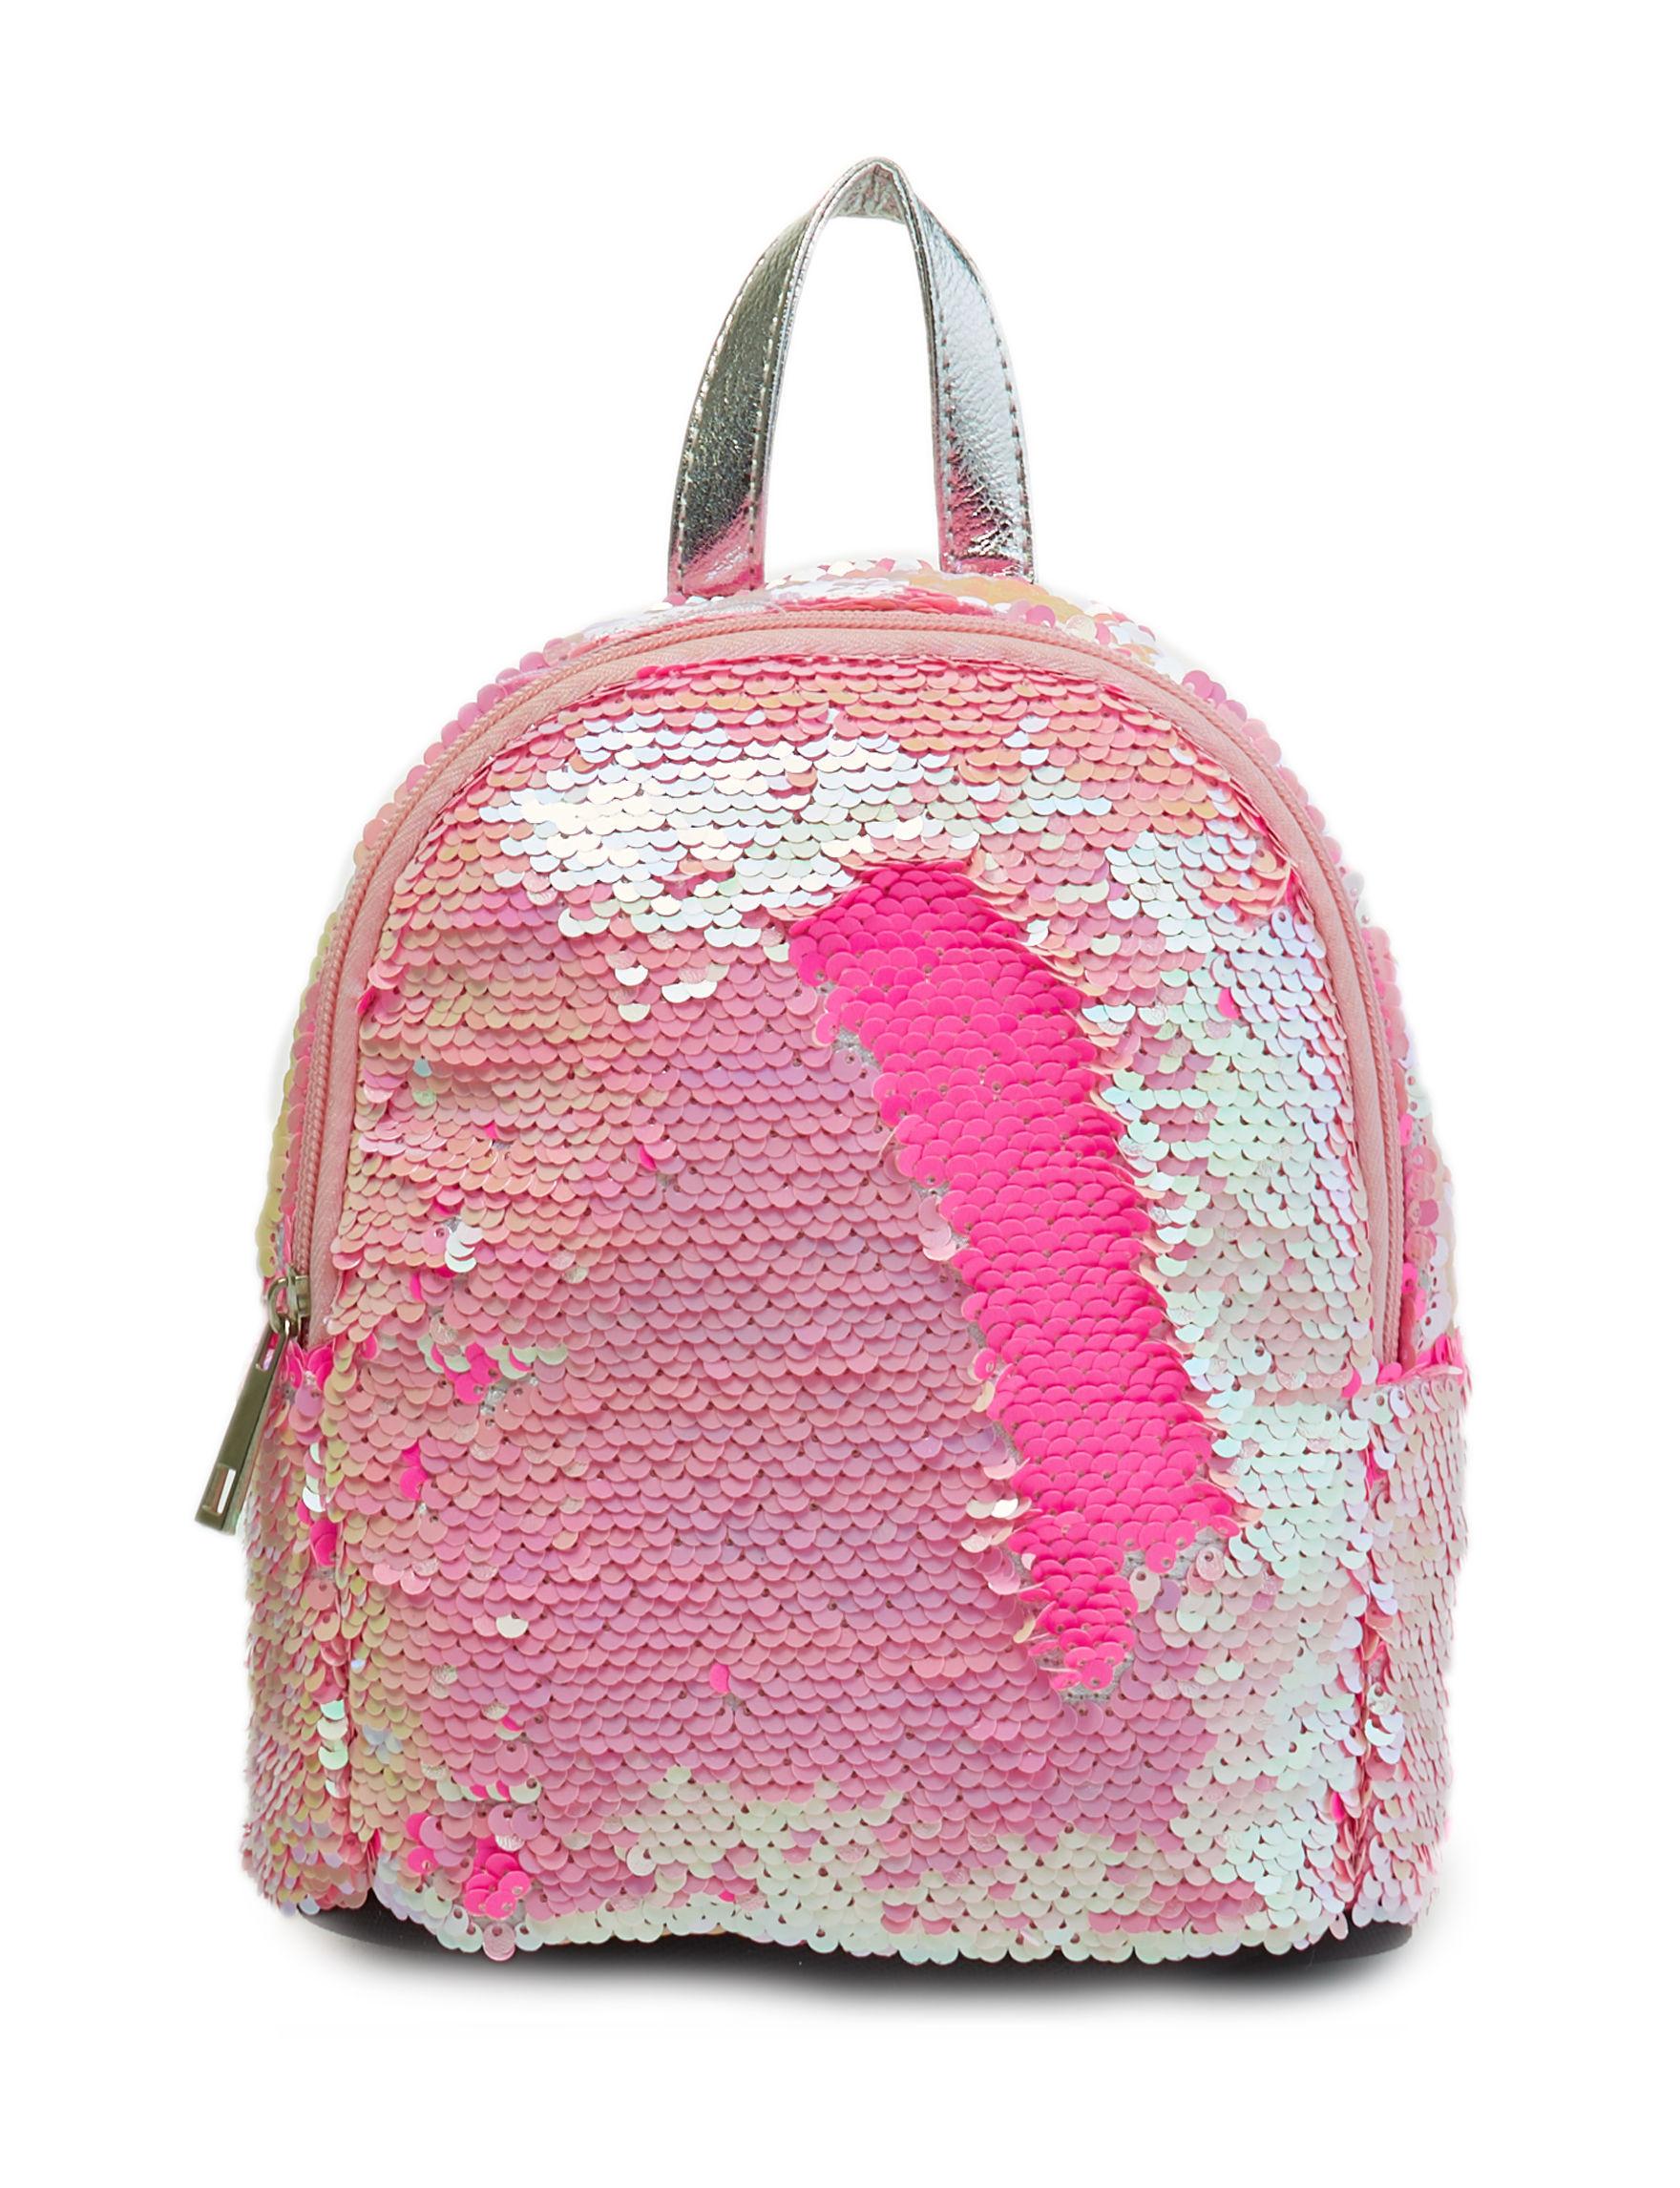 Capelli Pink Bookbags & Backpacks